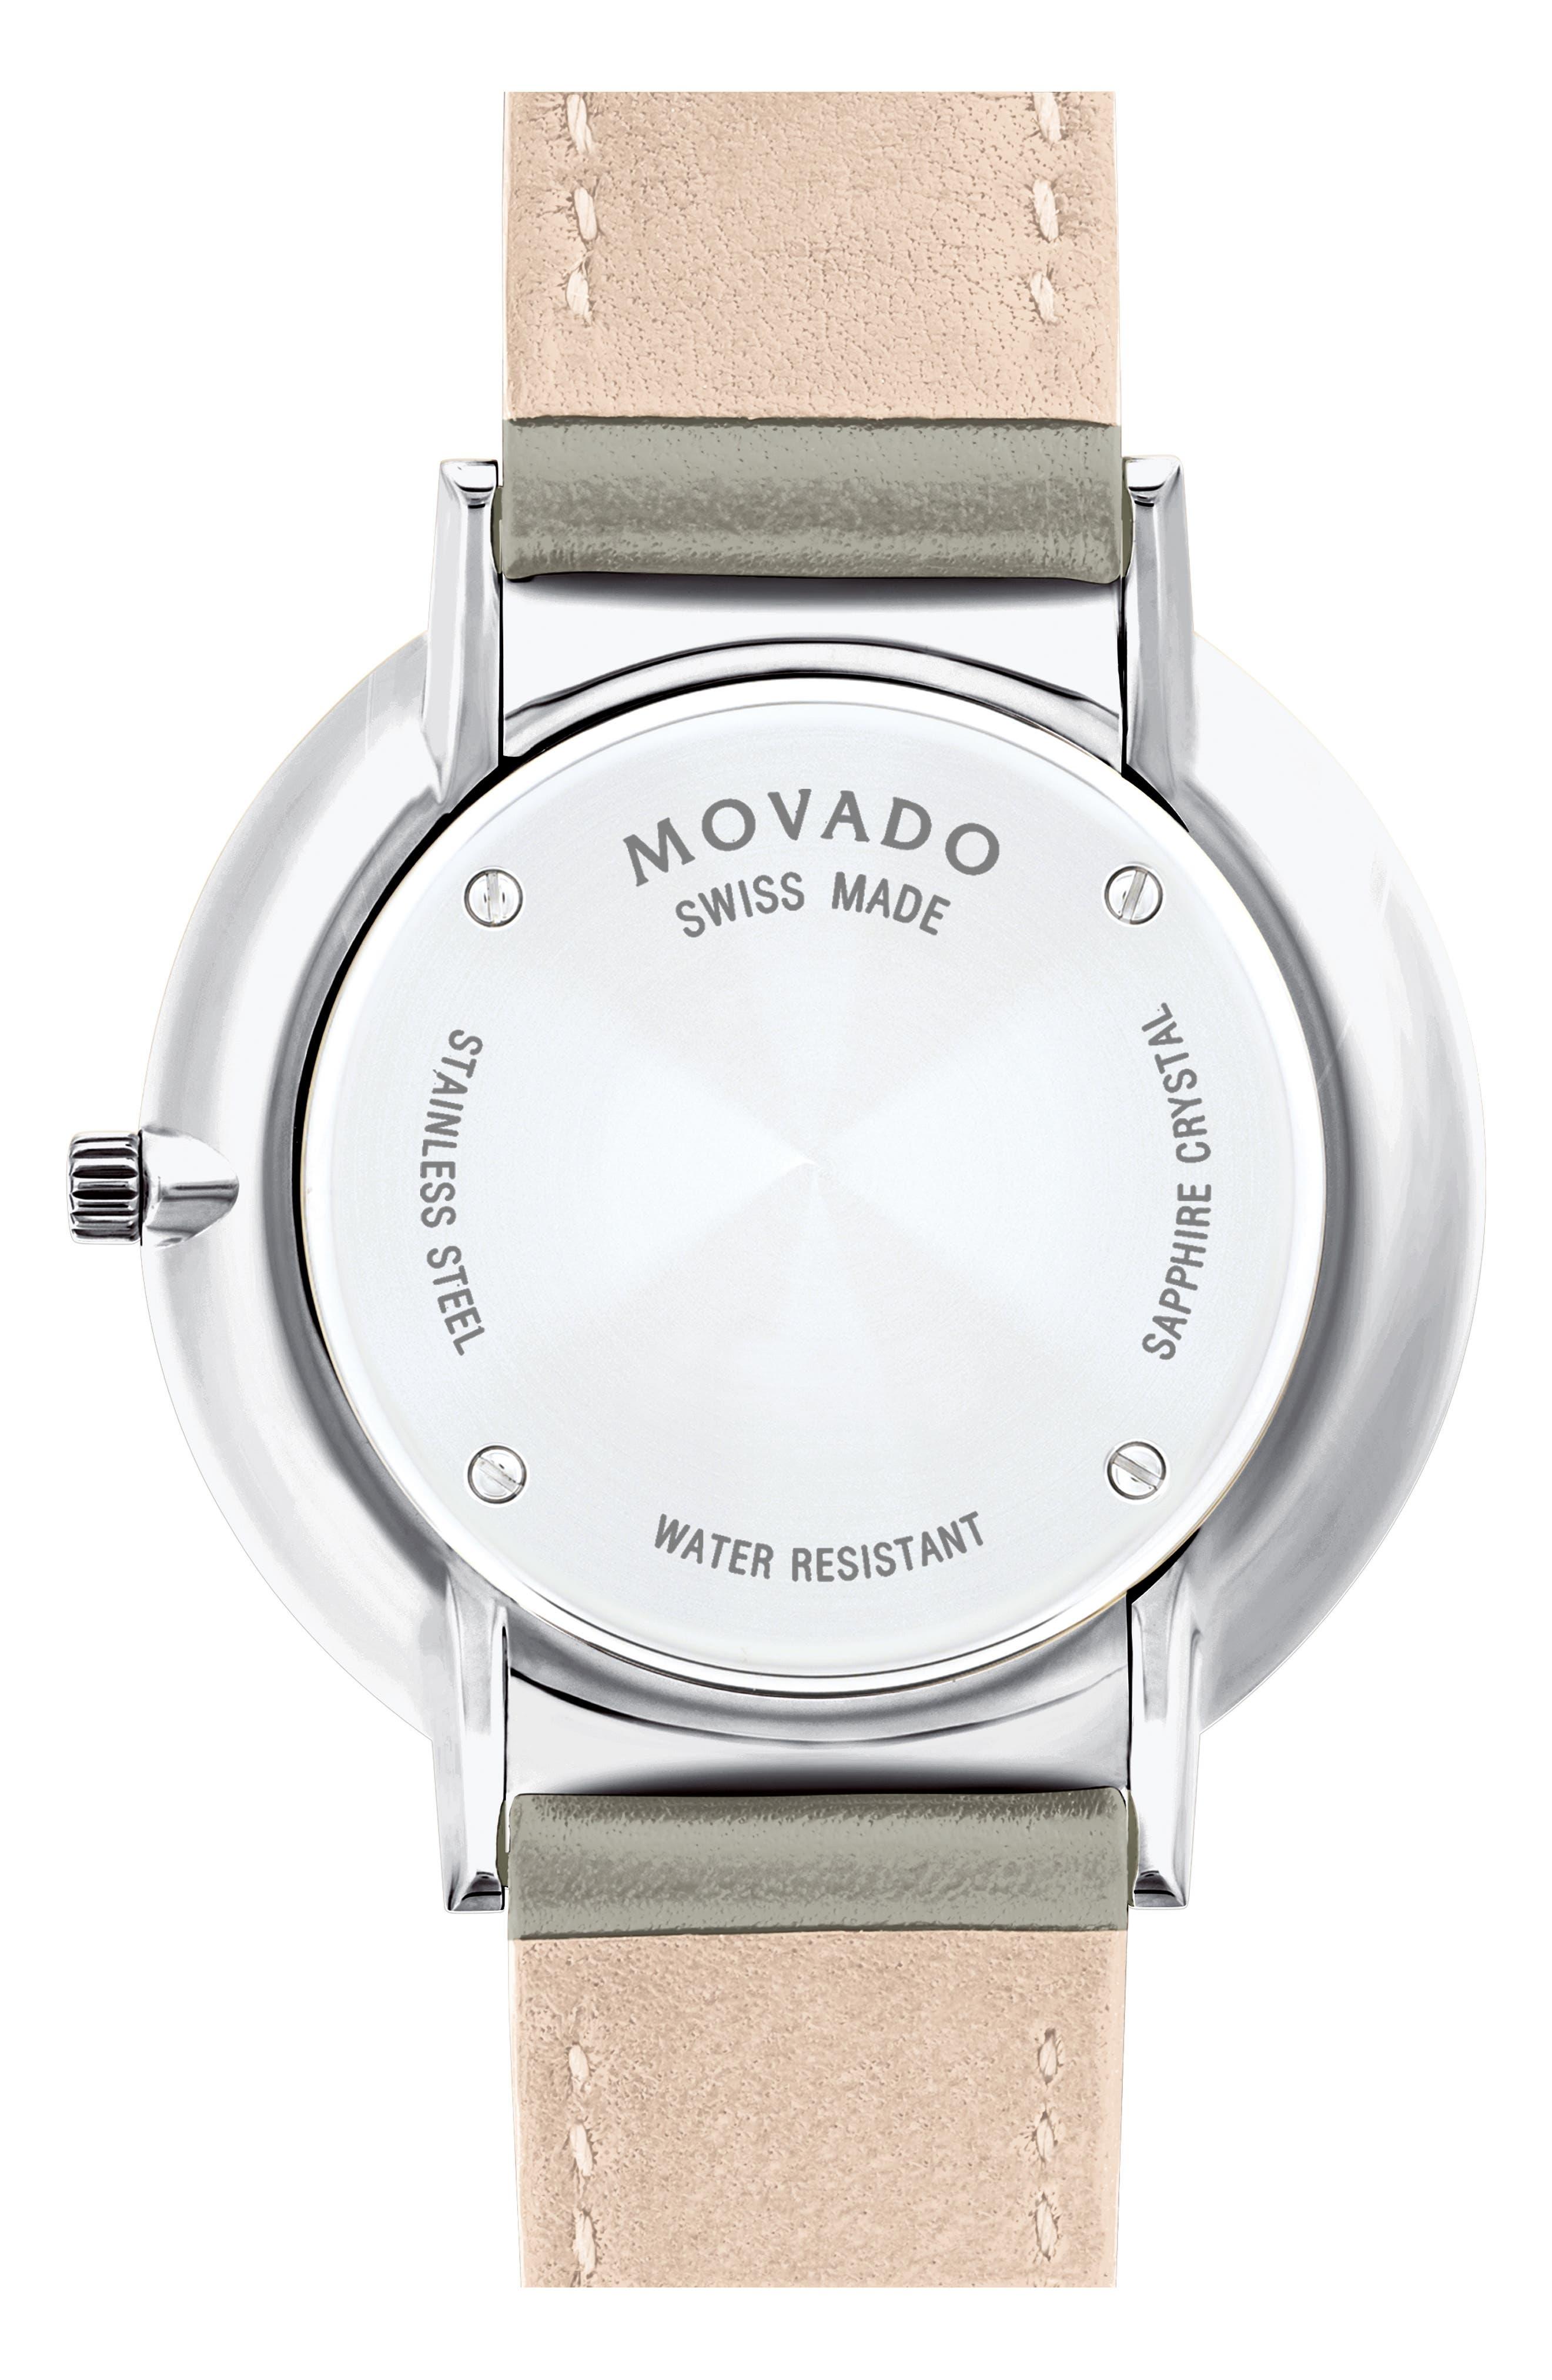 MOVADO, Ultraslim Leather Strap Watch, 35mm, Alternate thumbnail 2, color, GREY/ BEIGE/ SILVER